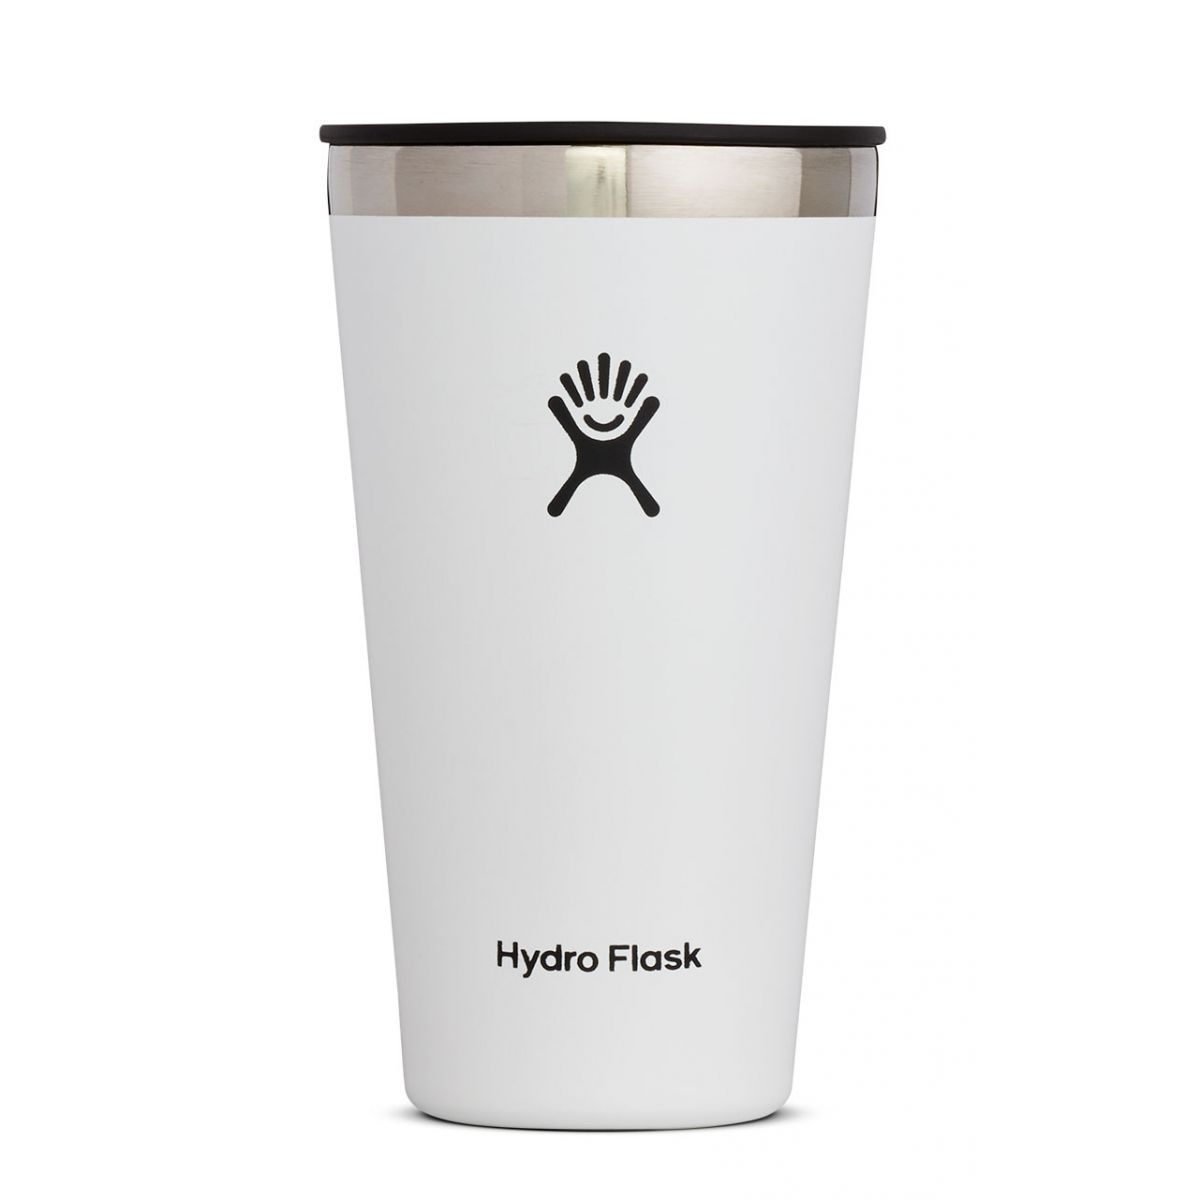 Bild von Hydro Flask 16 oz Tumbler Thermobecher 473ml - White